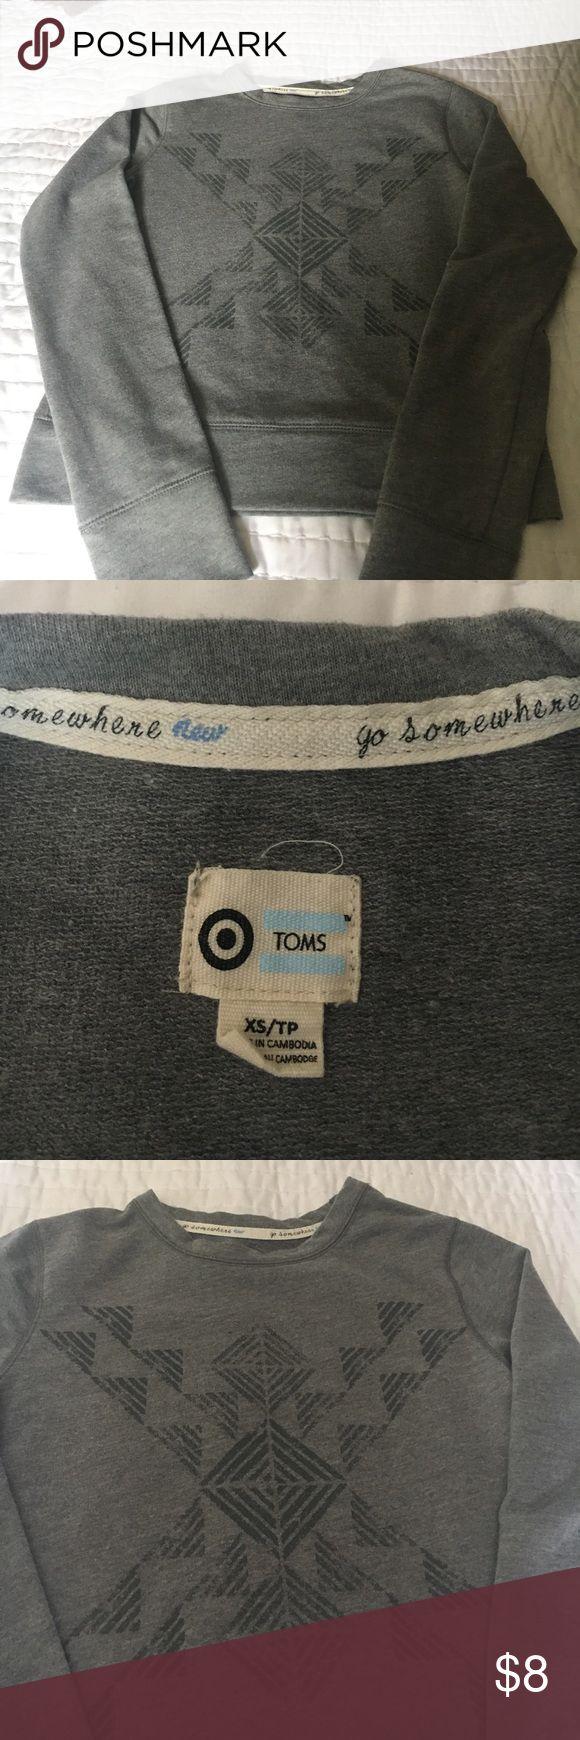 TOMS sweatshirt Gray TOMS sweatshirt. Heather gray with a darker gray Aztec front design. Light weight and cute and classic. TOMS Tops Sweatshirts & Hoodies